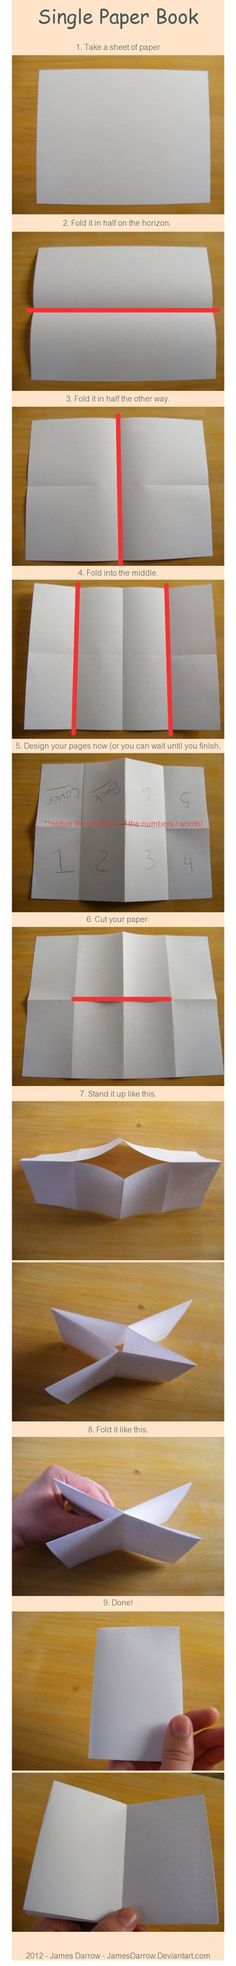 Single Paper Book by =JamesDarrow on deviantART 학습자가 직접 만들어 그날 학습한 내용을 책으로 구성하여 흥미를 느끼는 동시에 학습한 내용을 복습할 수 있도록 기회 제공